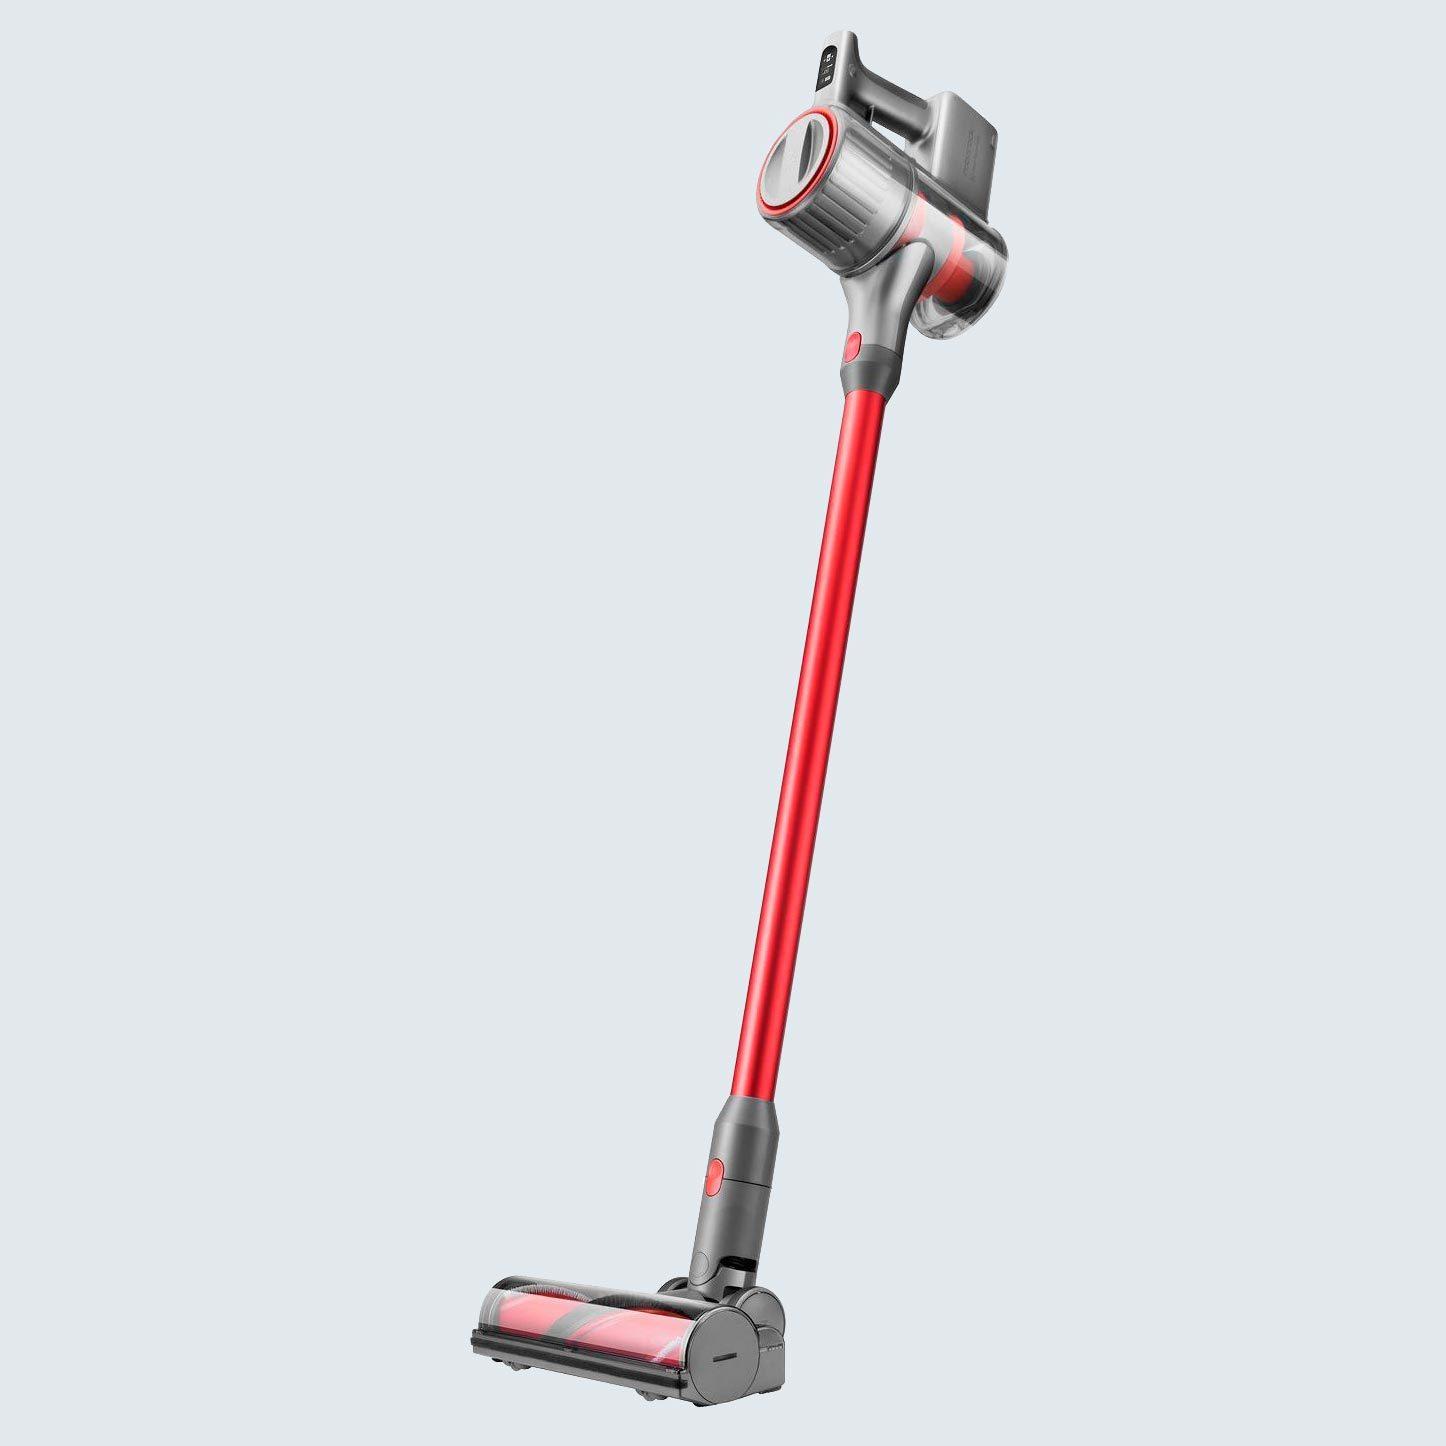 Roborock H6 Cordless Stick Vacuum with HEPA Filter